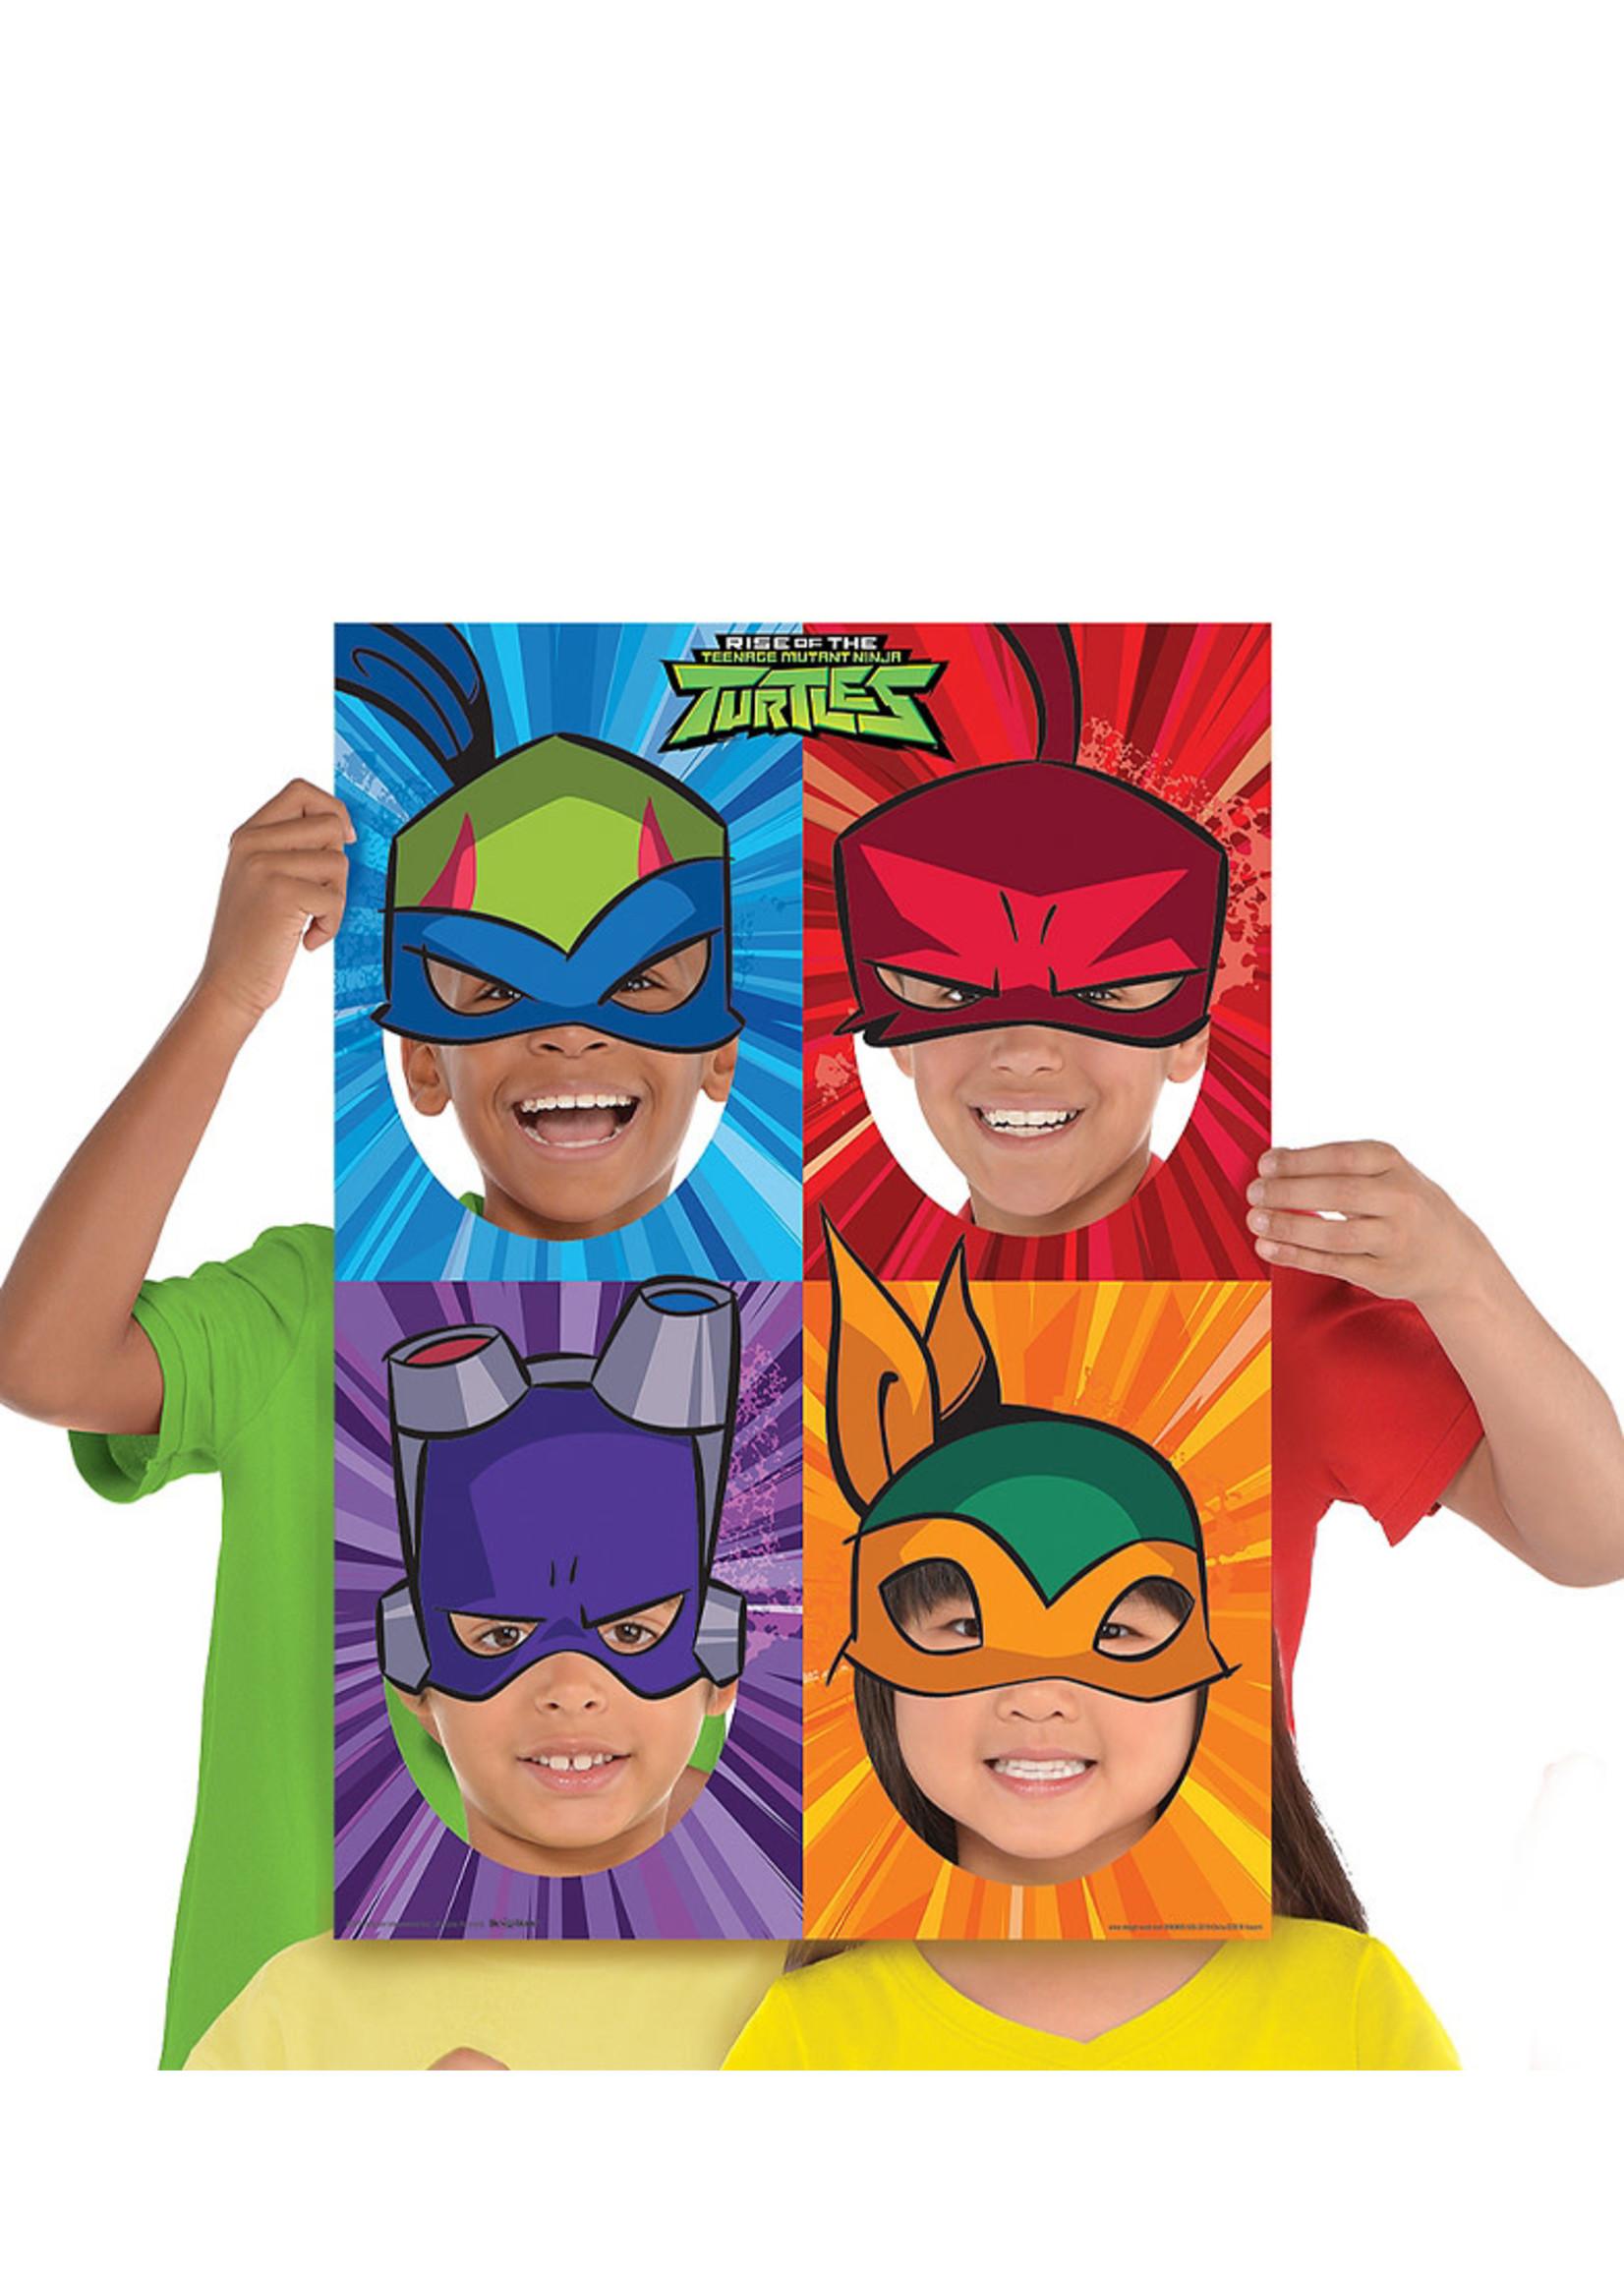 Rise of the Teenage Mutant Ninja Turtles Photo Booth Frame